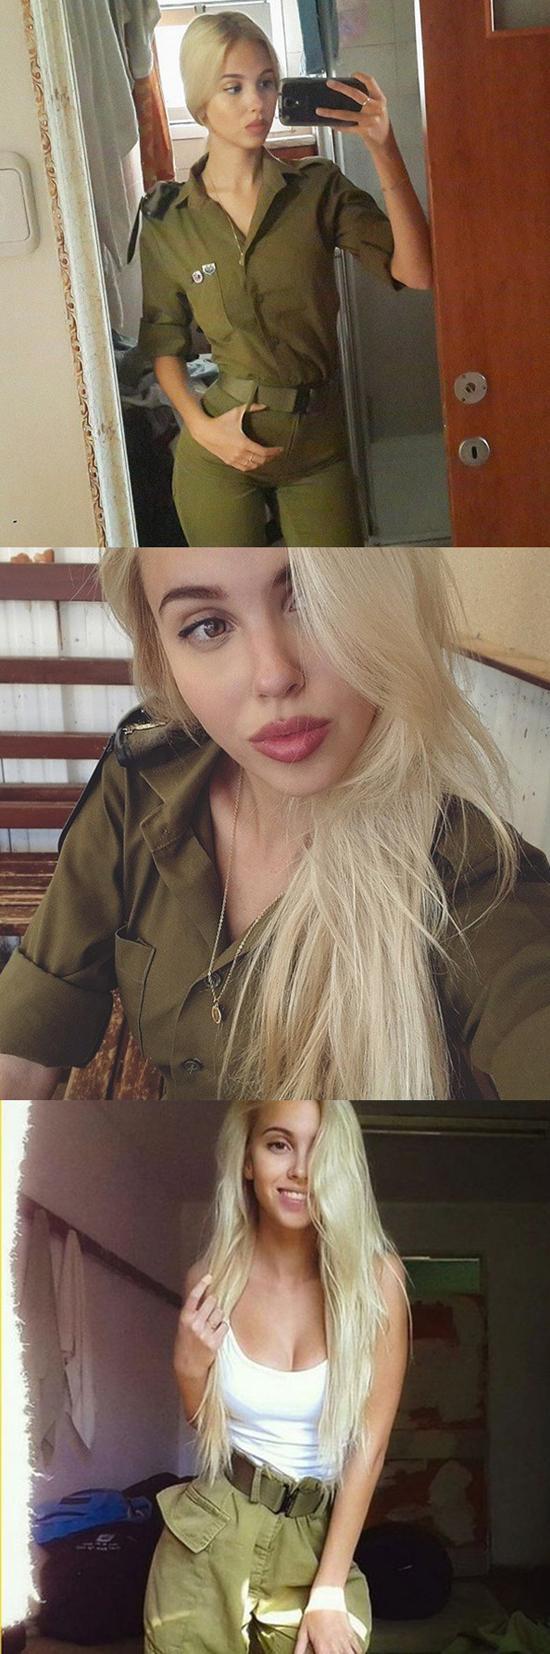 Maria Domark - 以色列女兵模特兒身材超火辣,翹臀超性感,爆乳超豐滿、軍服隱藏不住的姣好曲線若量產世界就毀了